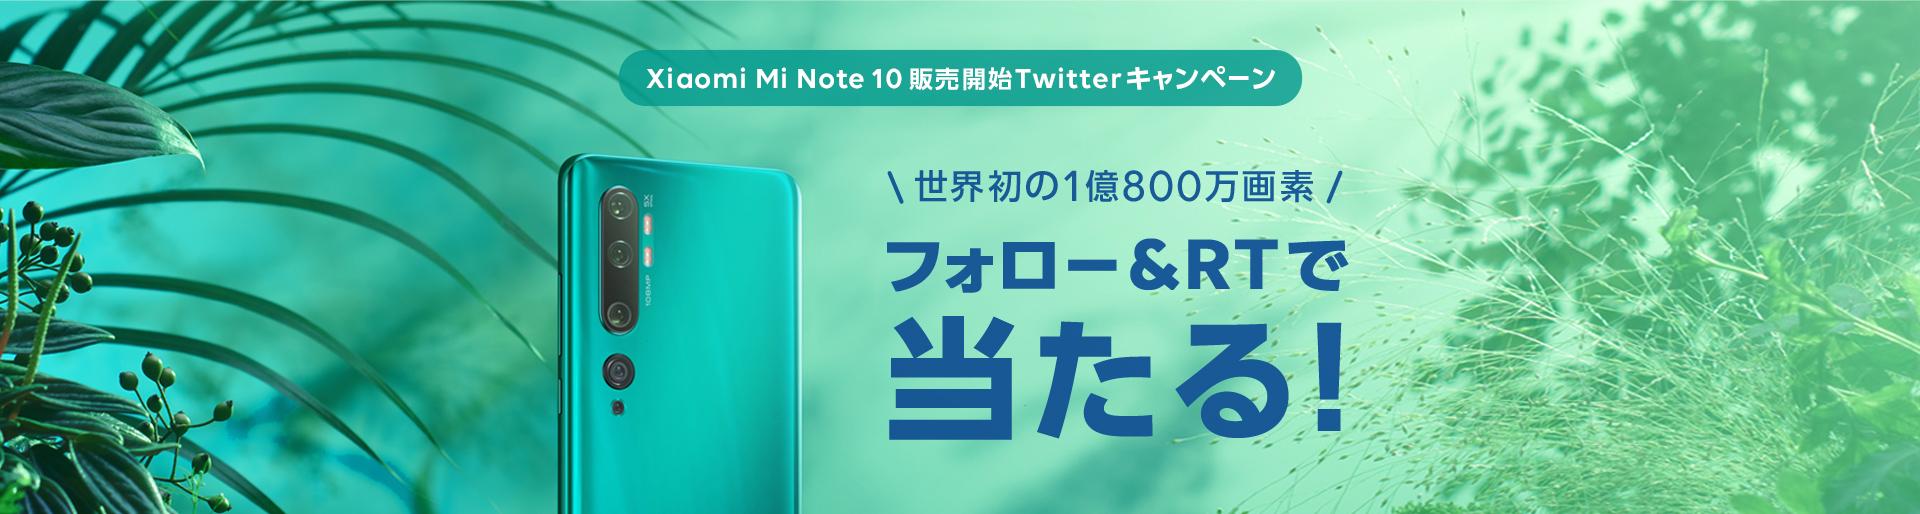 Xiaomi Mi Note 10販売開始Twitterキャンペーン  世界初の1億800万画素  フォロー&RTで当たる!